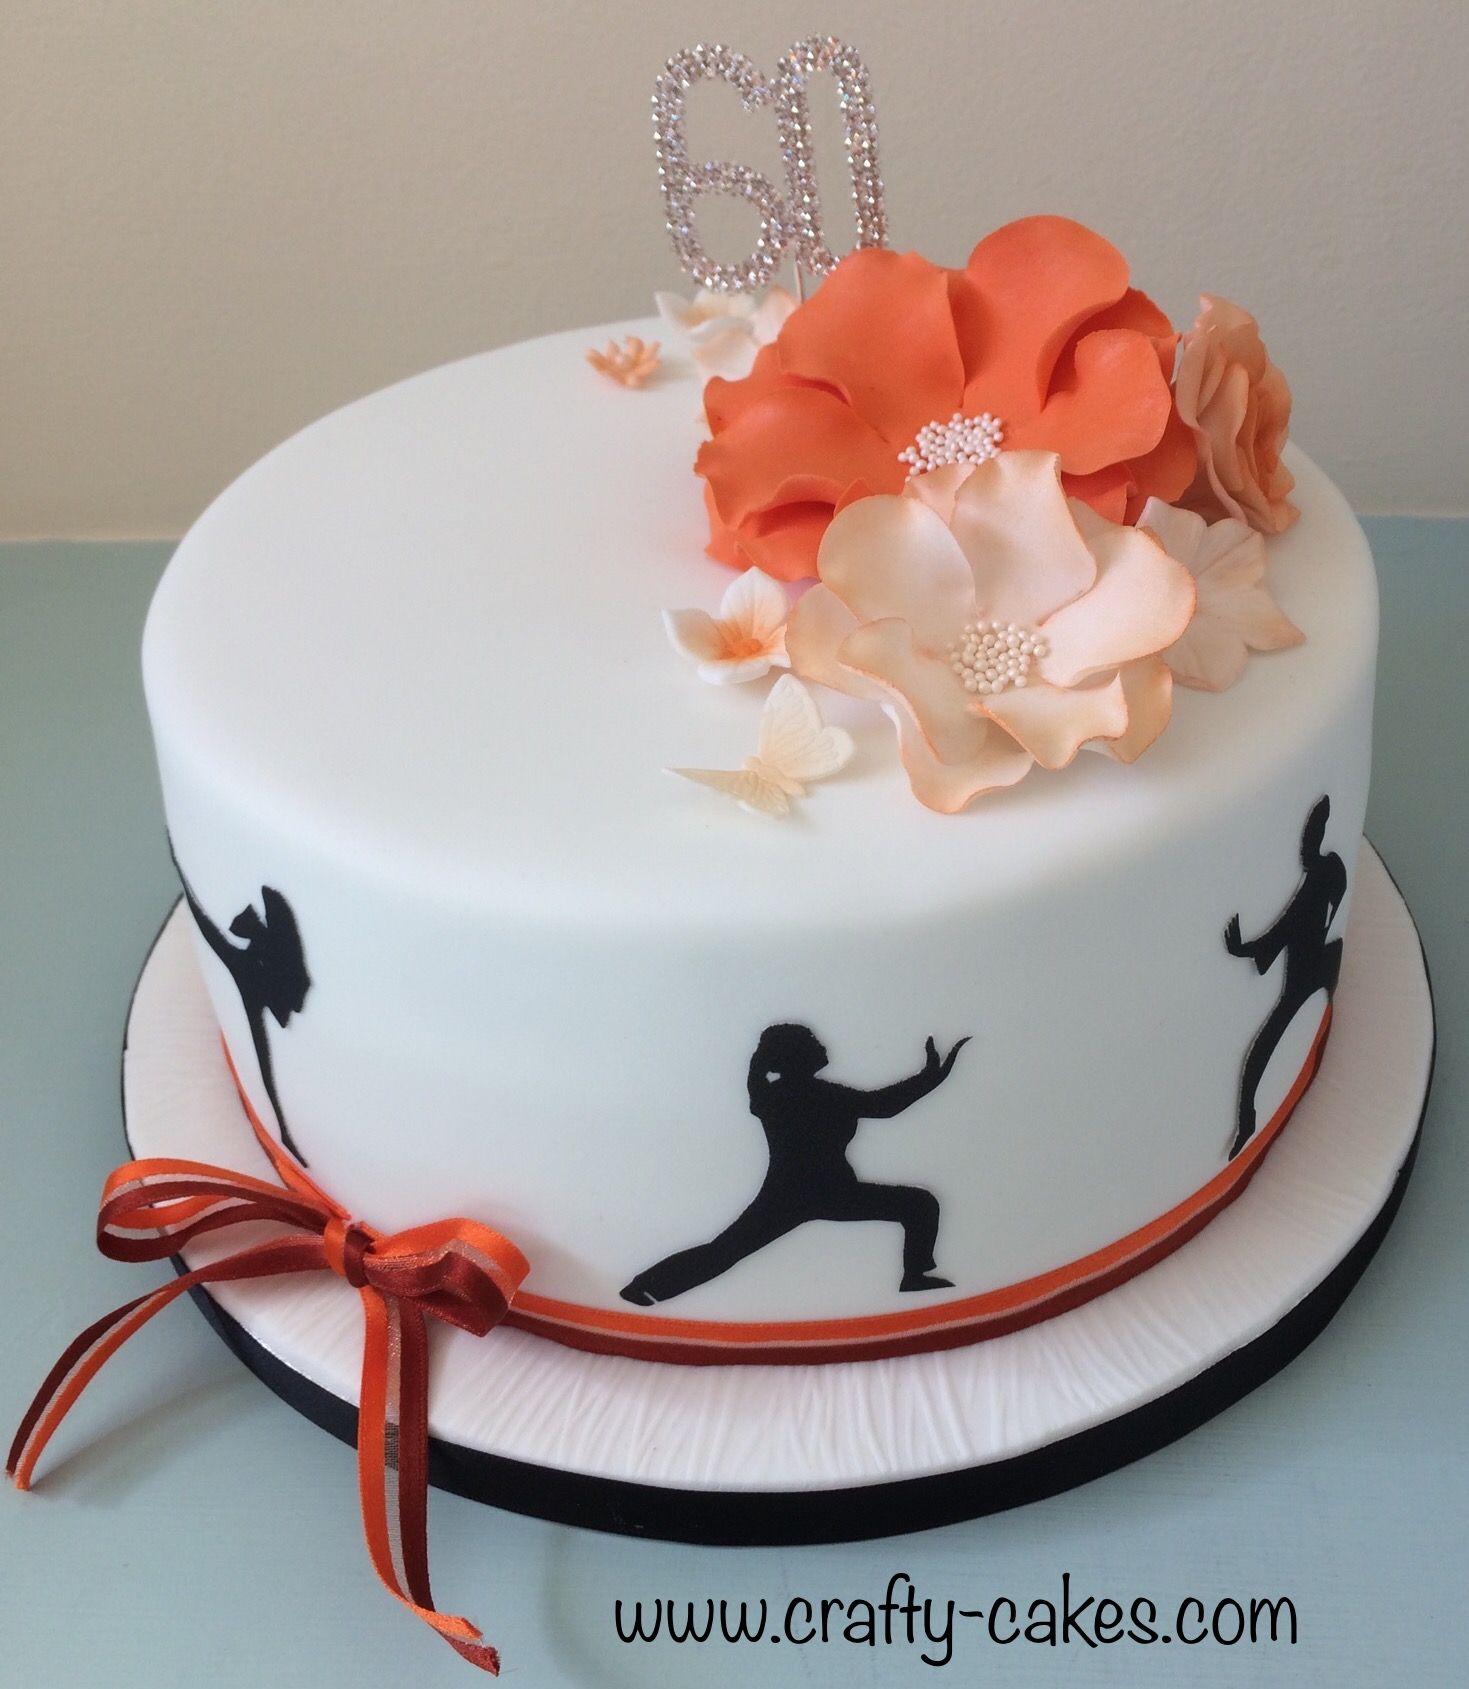 Pin On Www Crafty Cakes Com